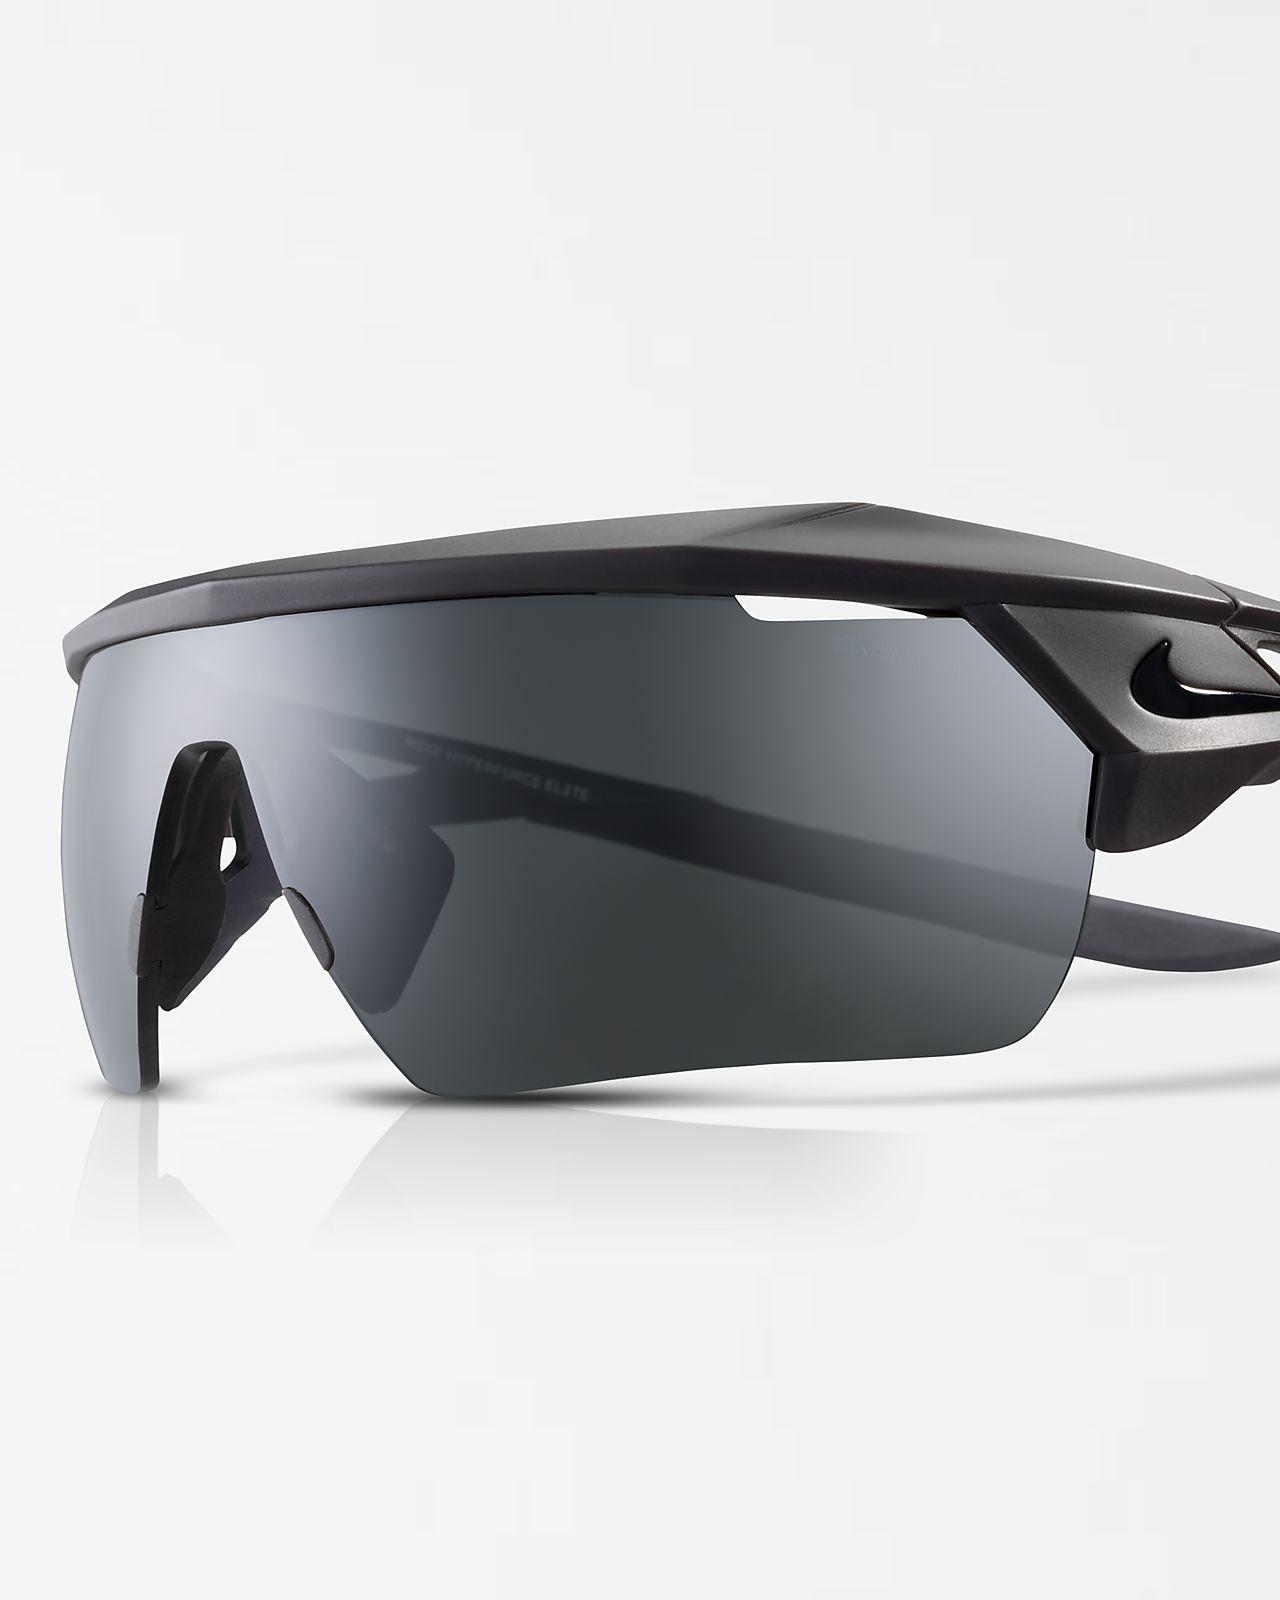 Nike Hyperforce Elite Mirrored Sunglasses